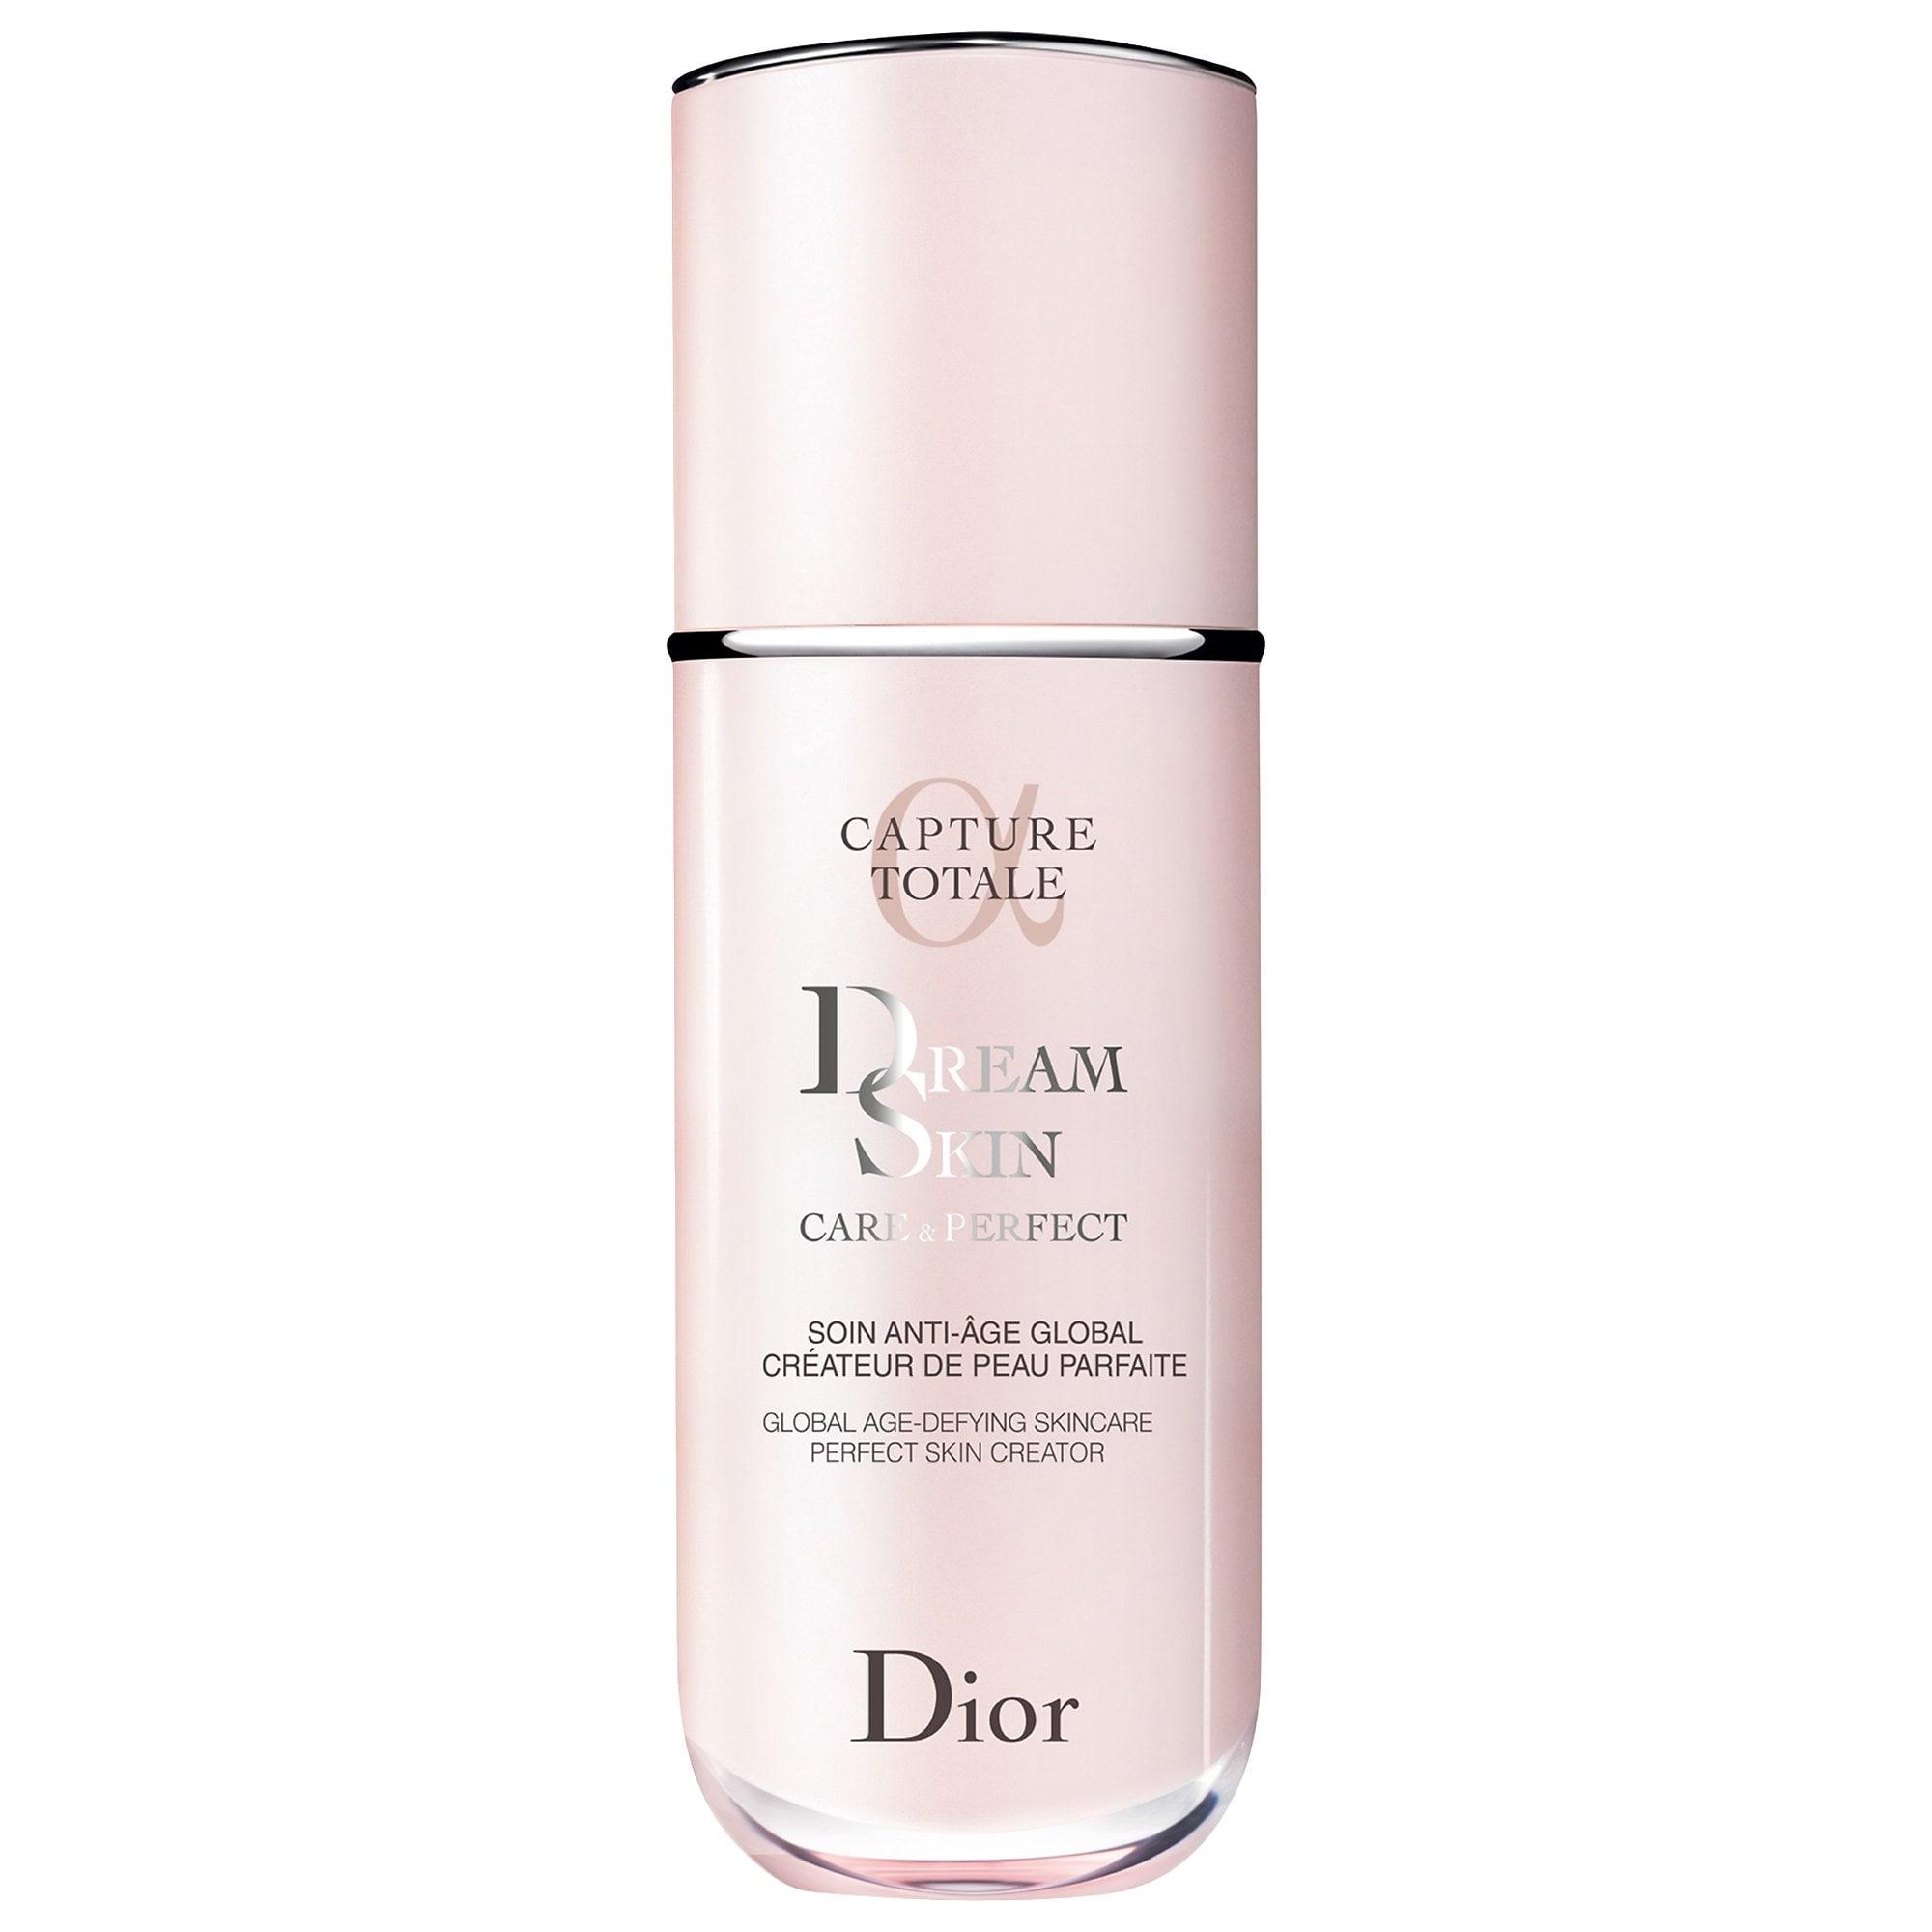 Dior - Dreamskin Skin Perfector